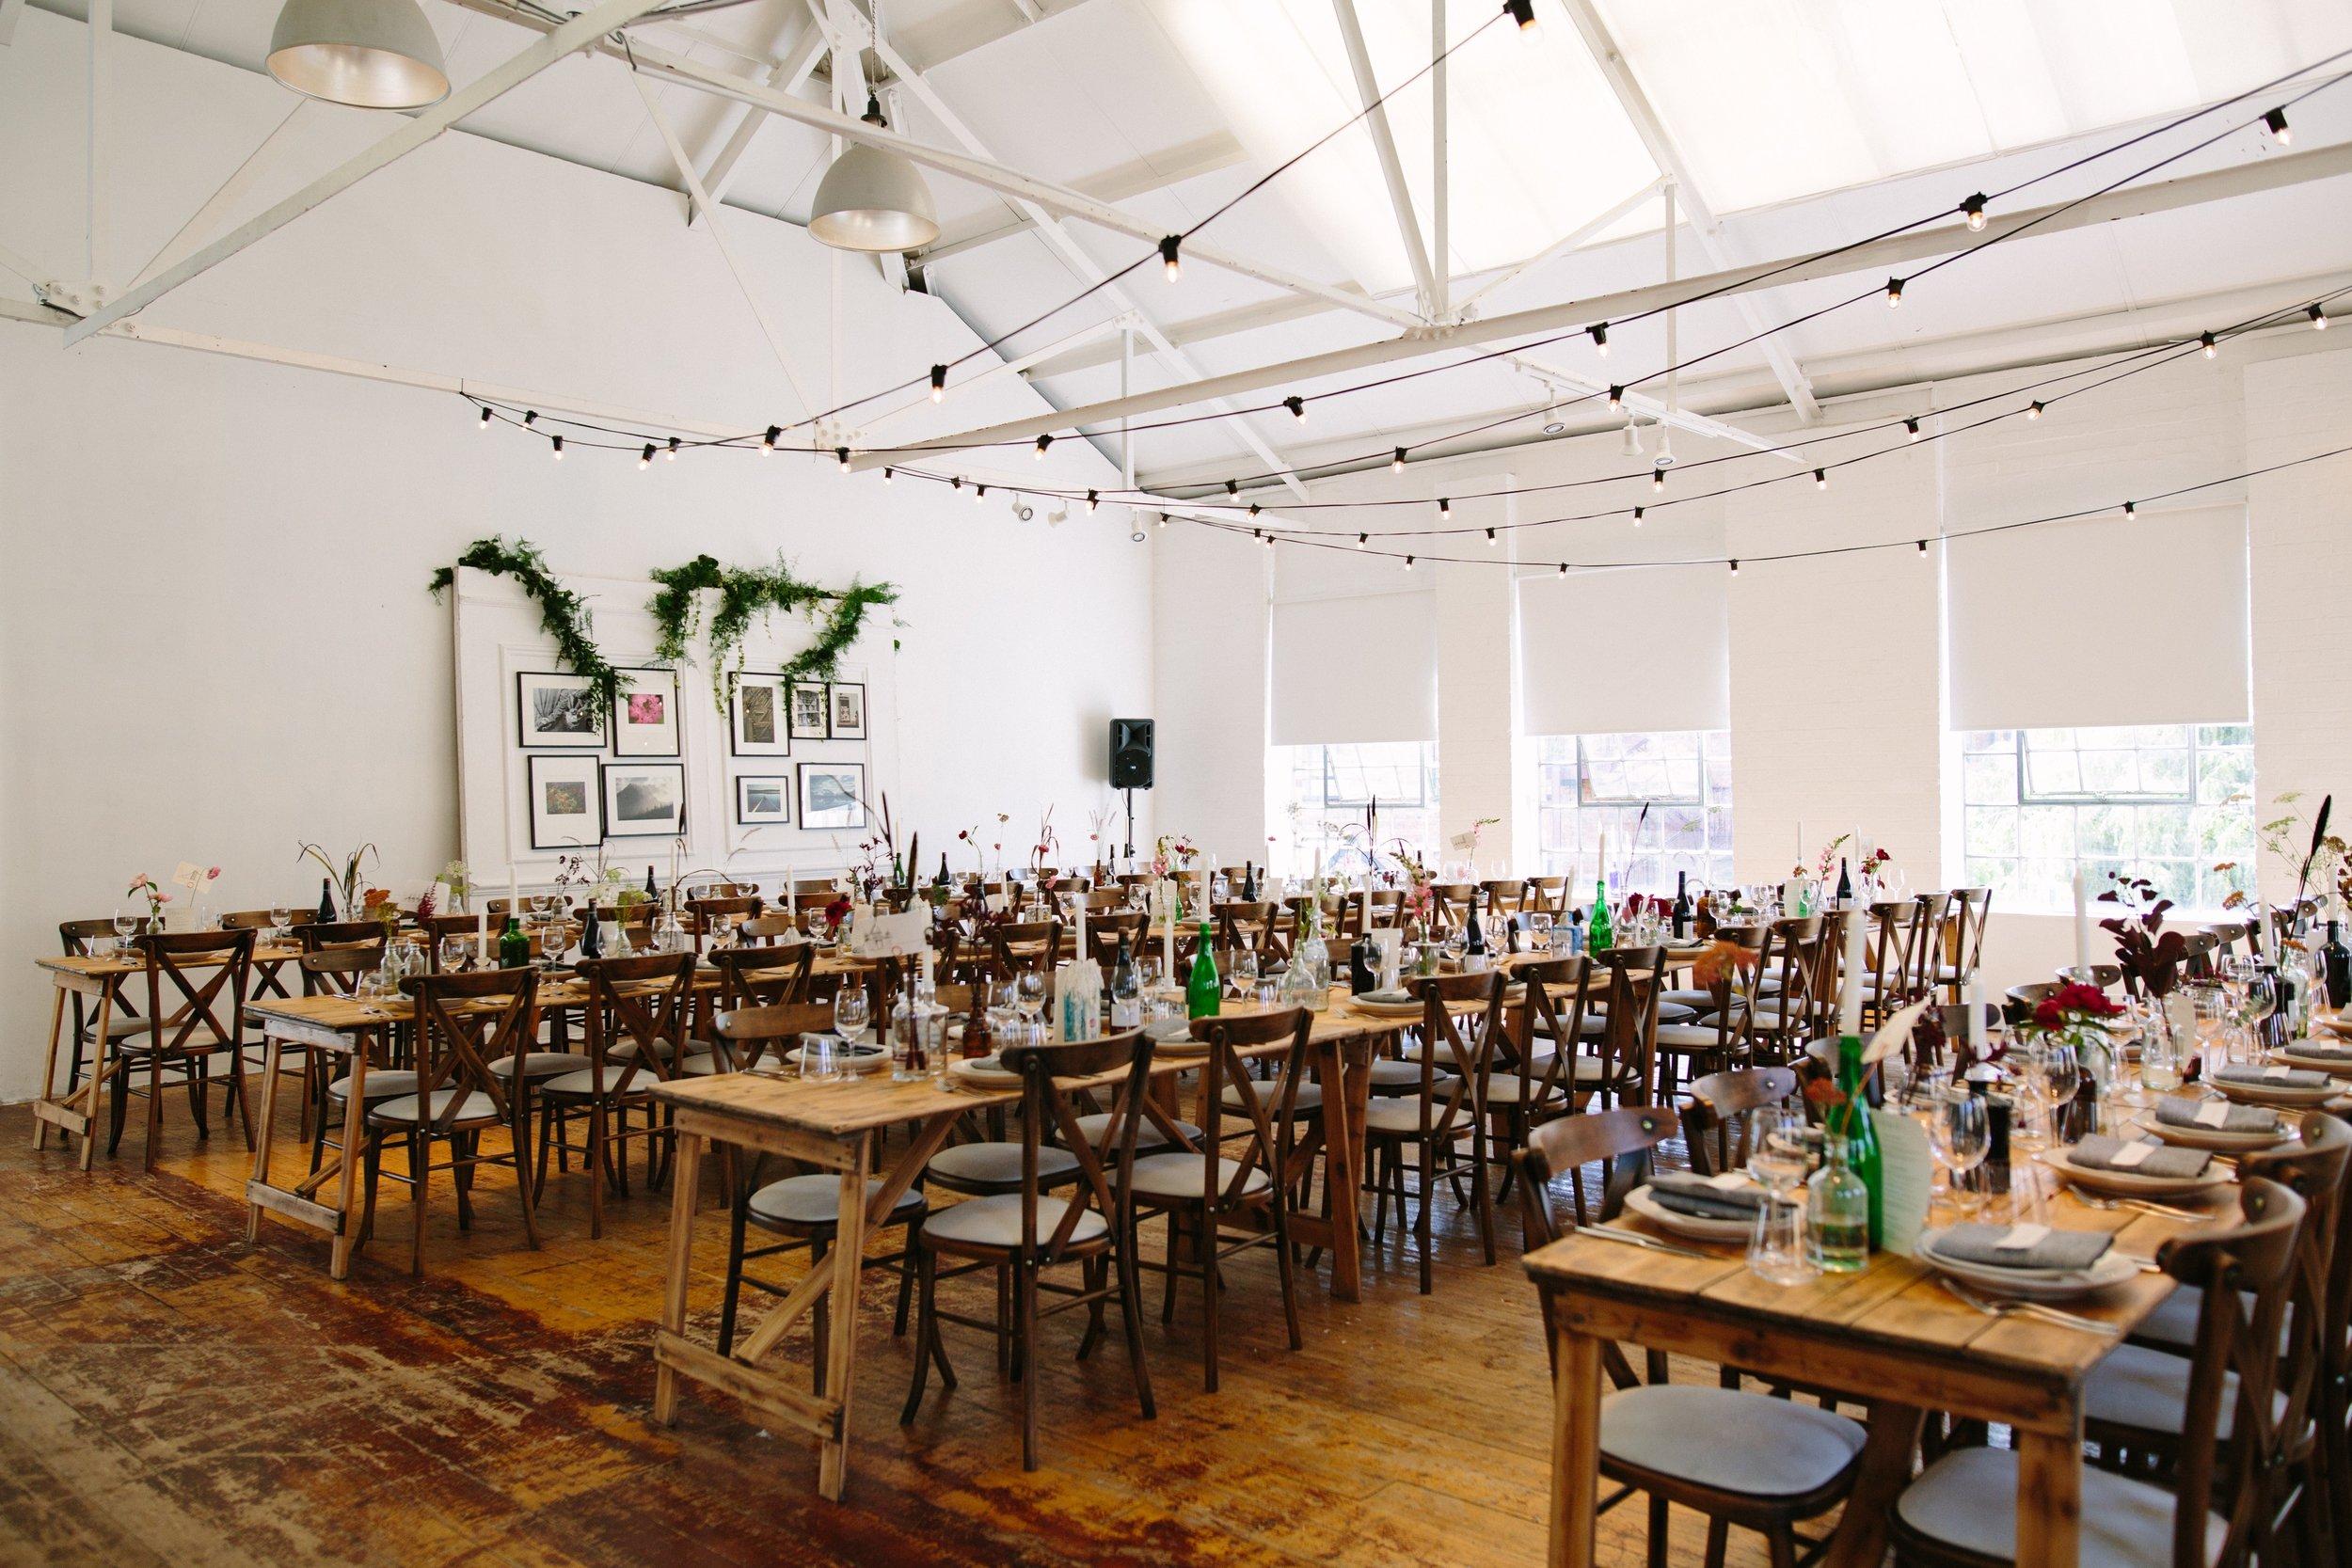 Warehouse Wedding Venue, Non-traditional wedding planner, London Wedding coordination, Event Bar, Bespoke weddings, Shoreditch Wedding, informal, Stylish, Event Planning, Dita Rosted Events